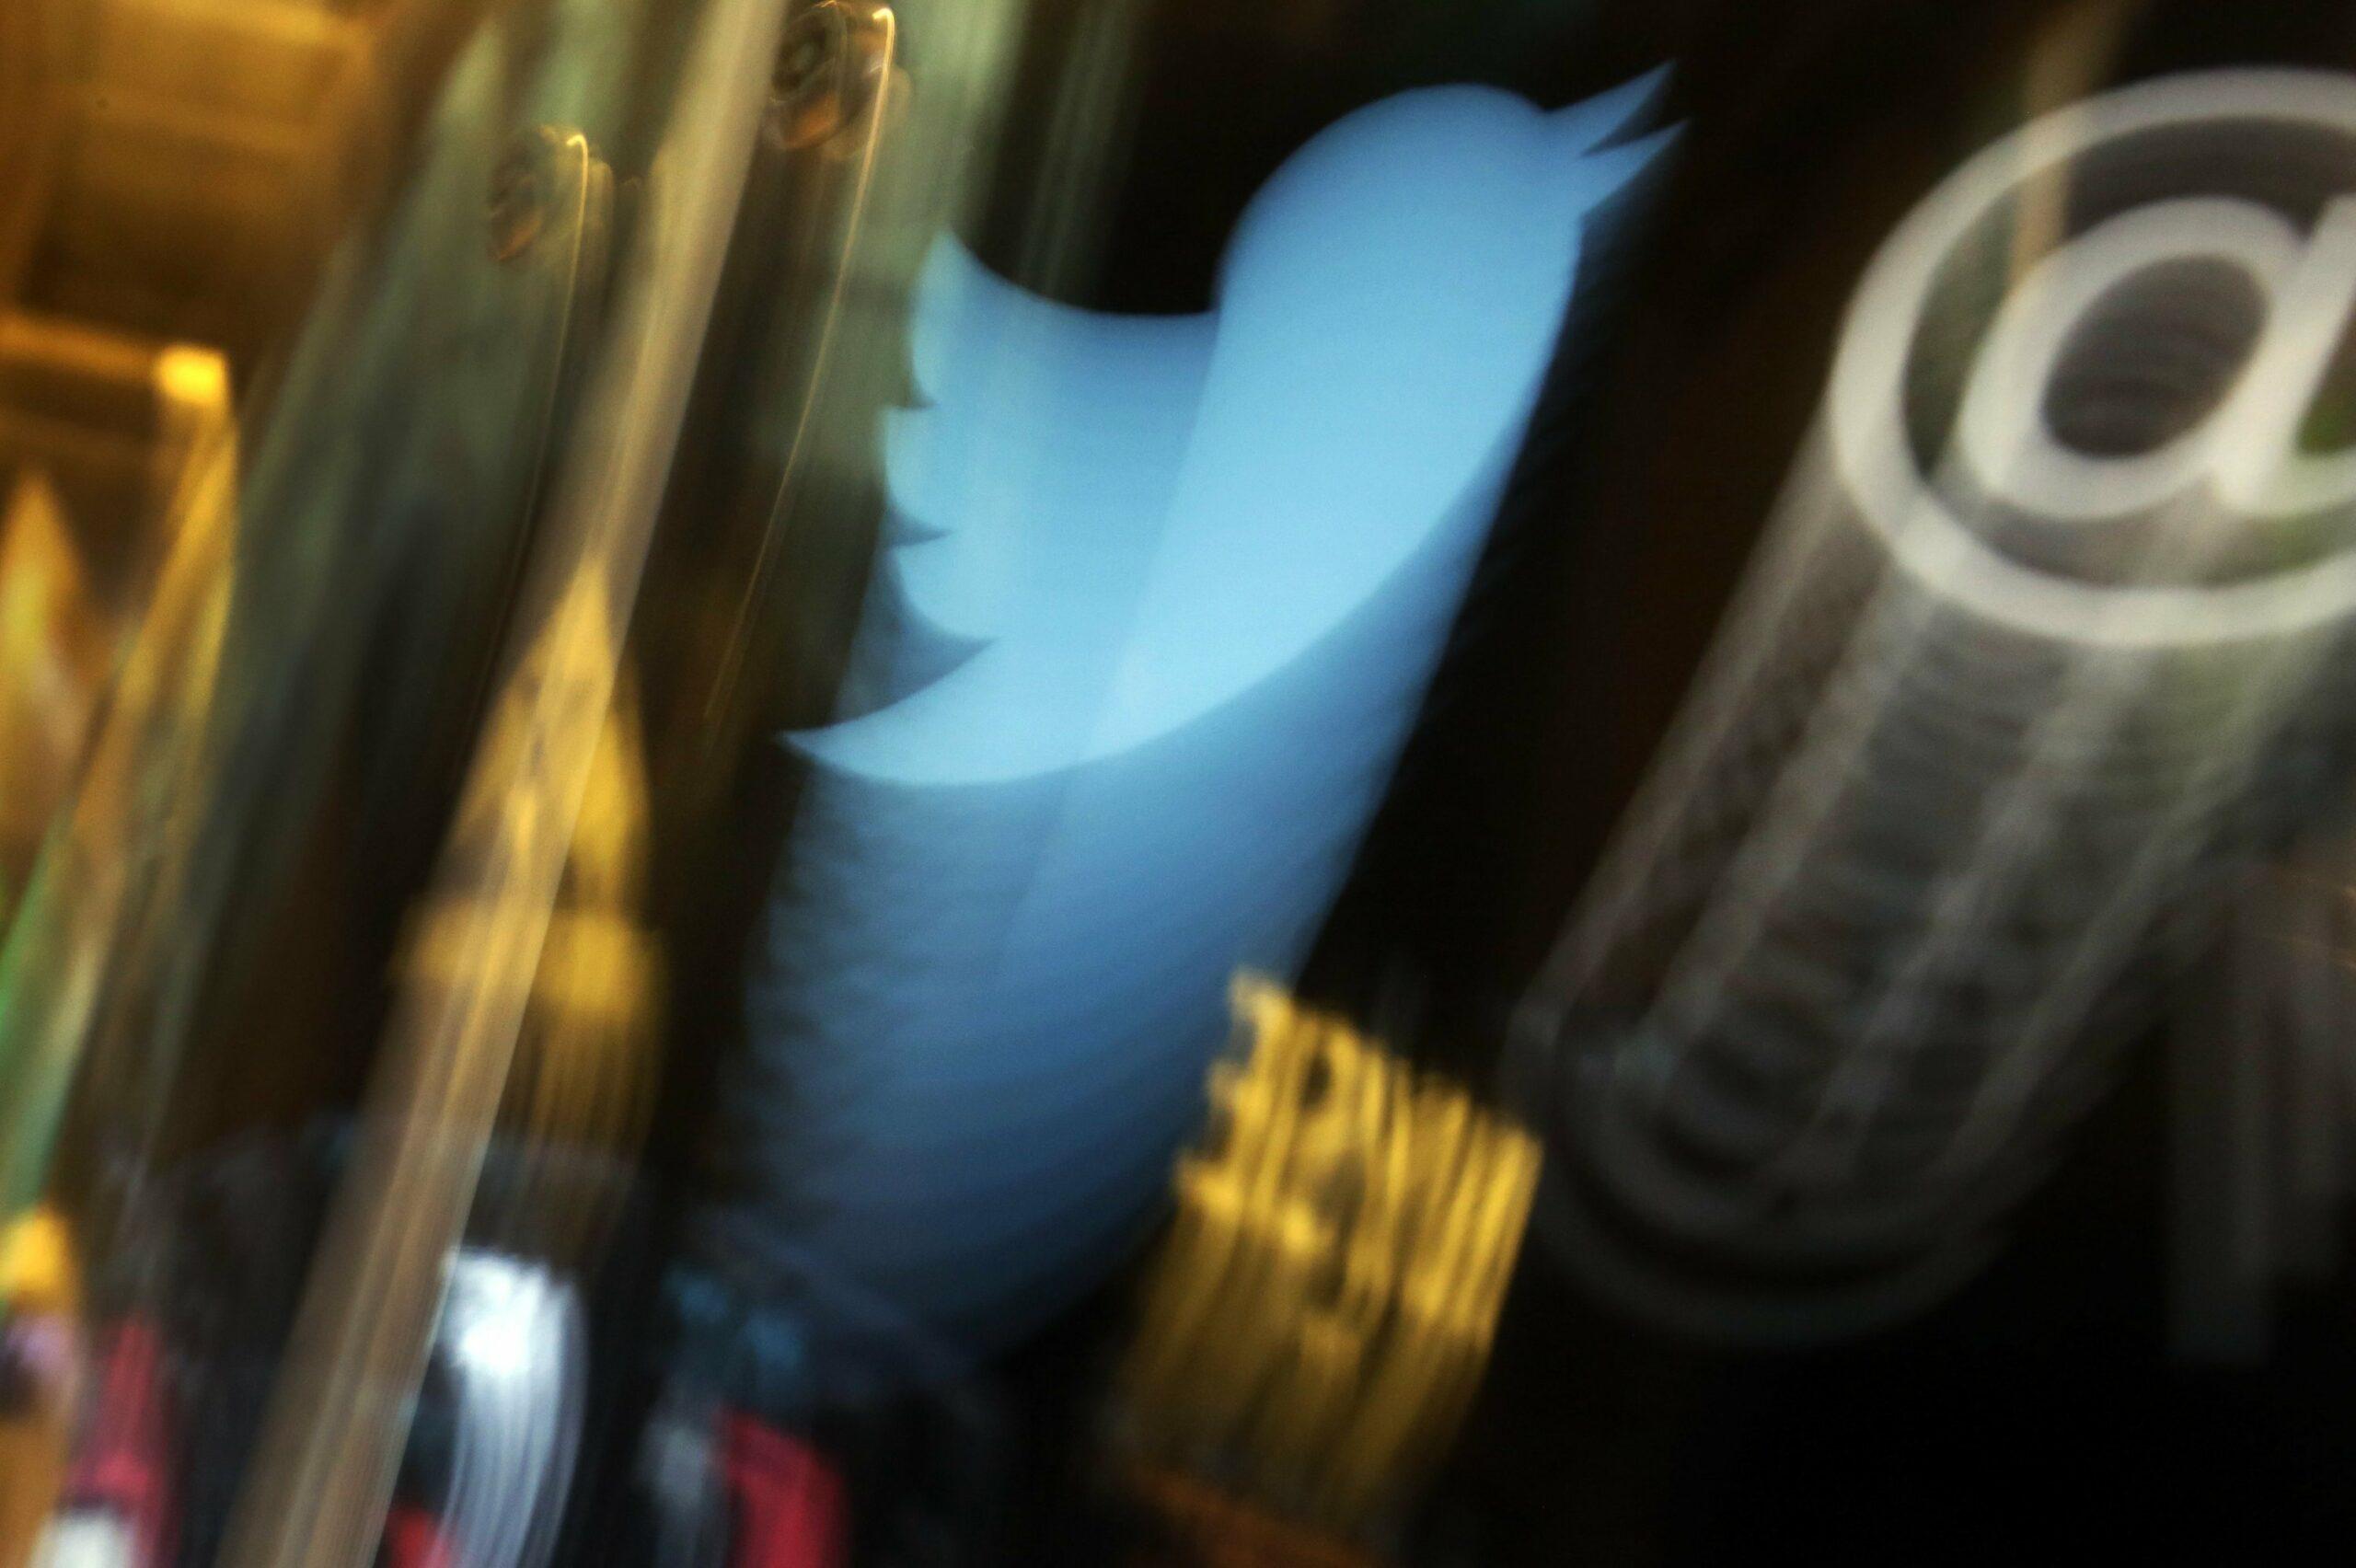 Hack strike 130 accounts, enterprise 'embarrassed'